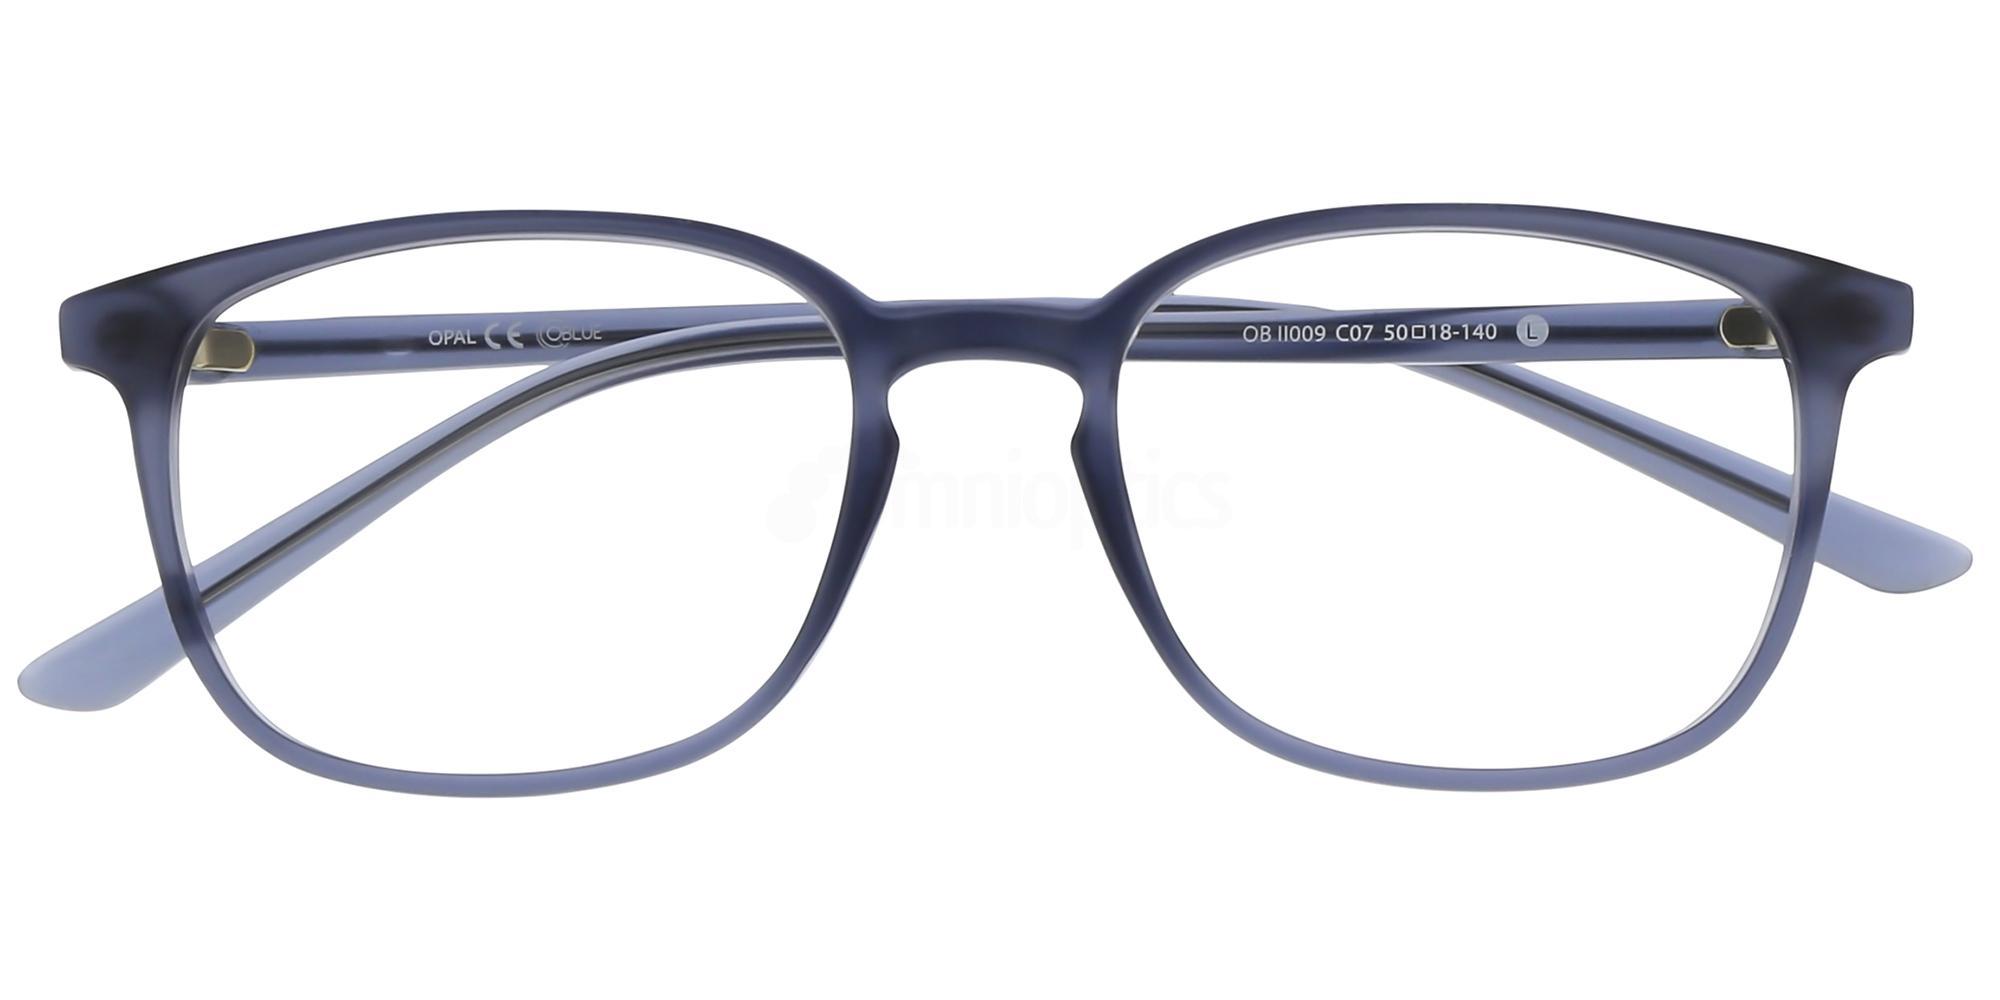 C07 OBII009L Glasses, Oblue